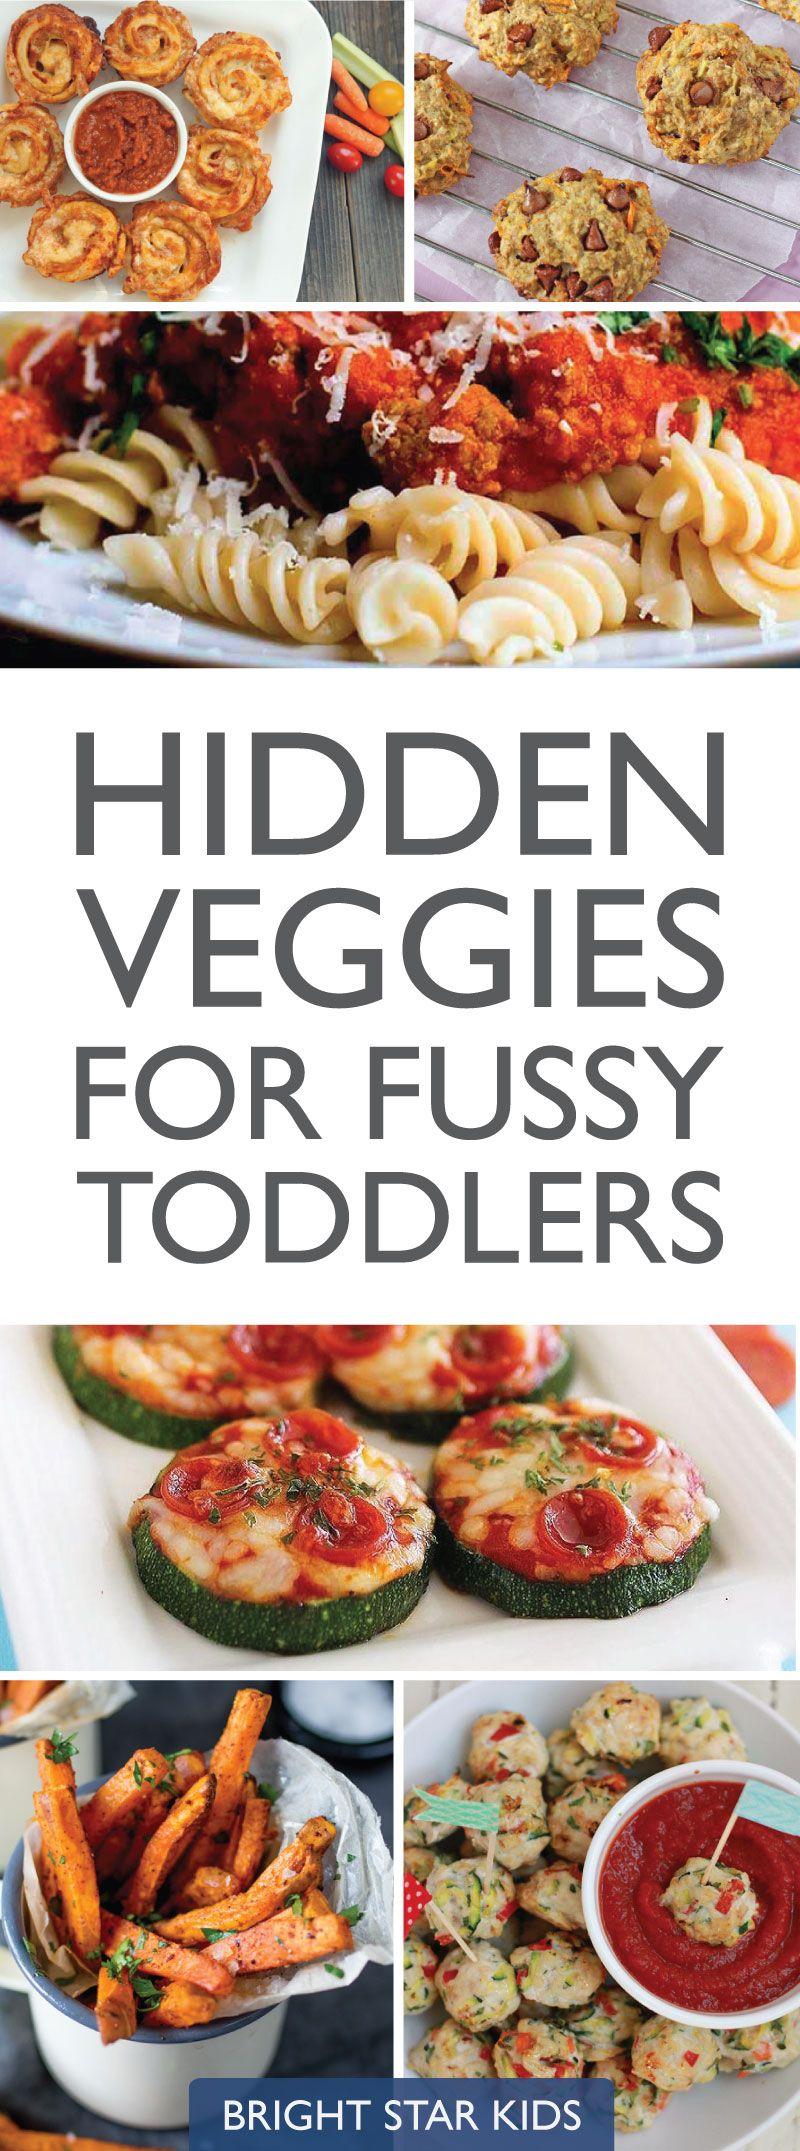 Hidden Veggies Recipes for Fussy Toddlers | Food Ideas | Toddler meals, Vegetarian kids, Kids meals